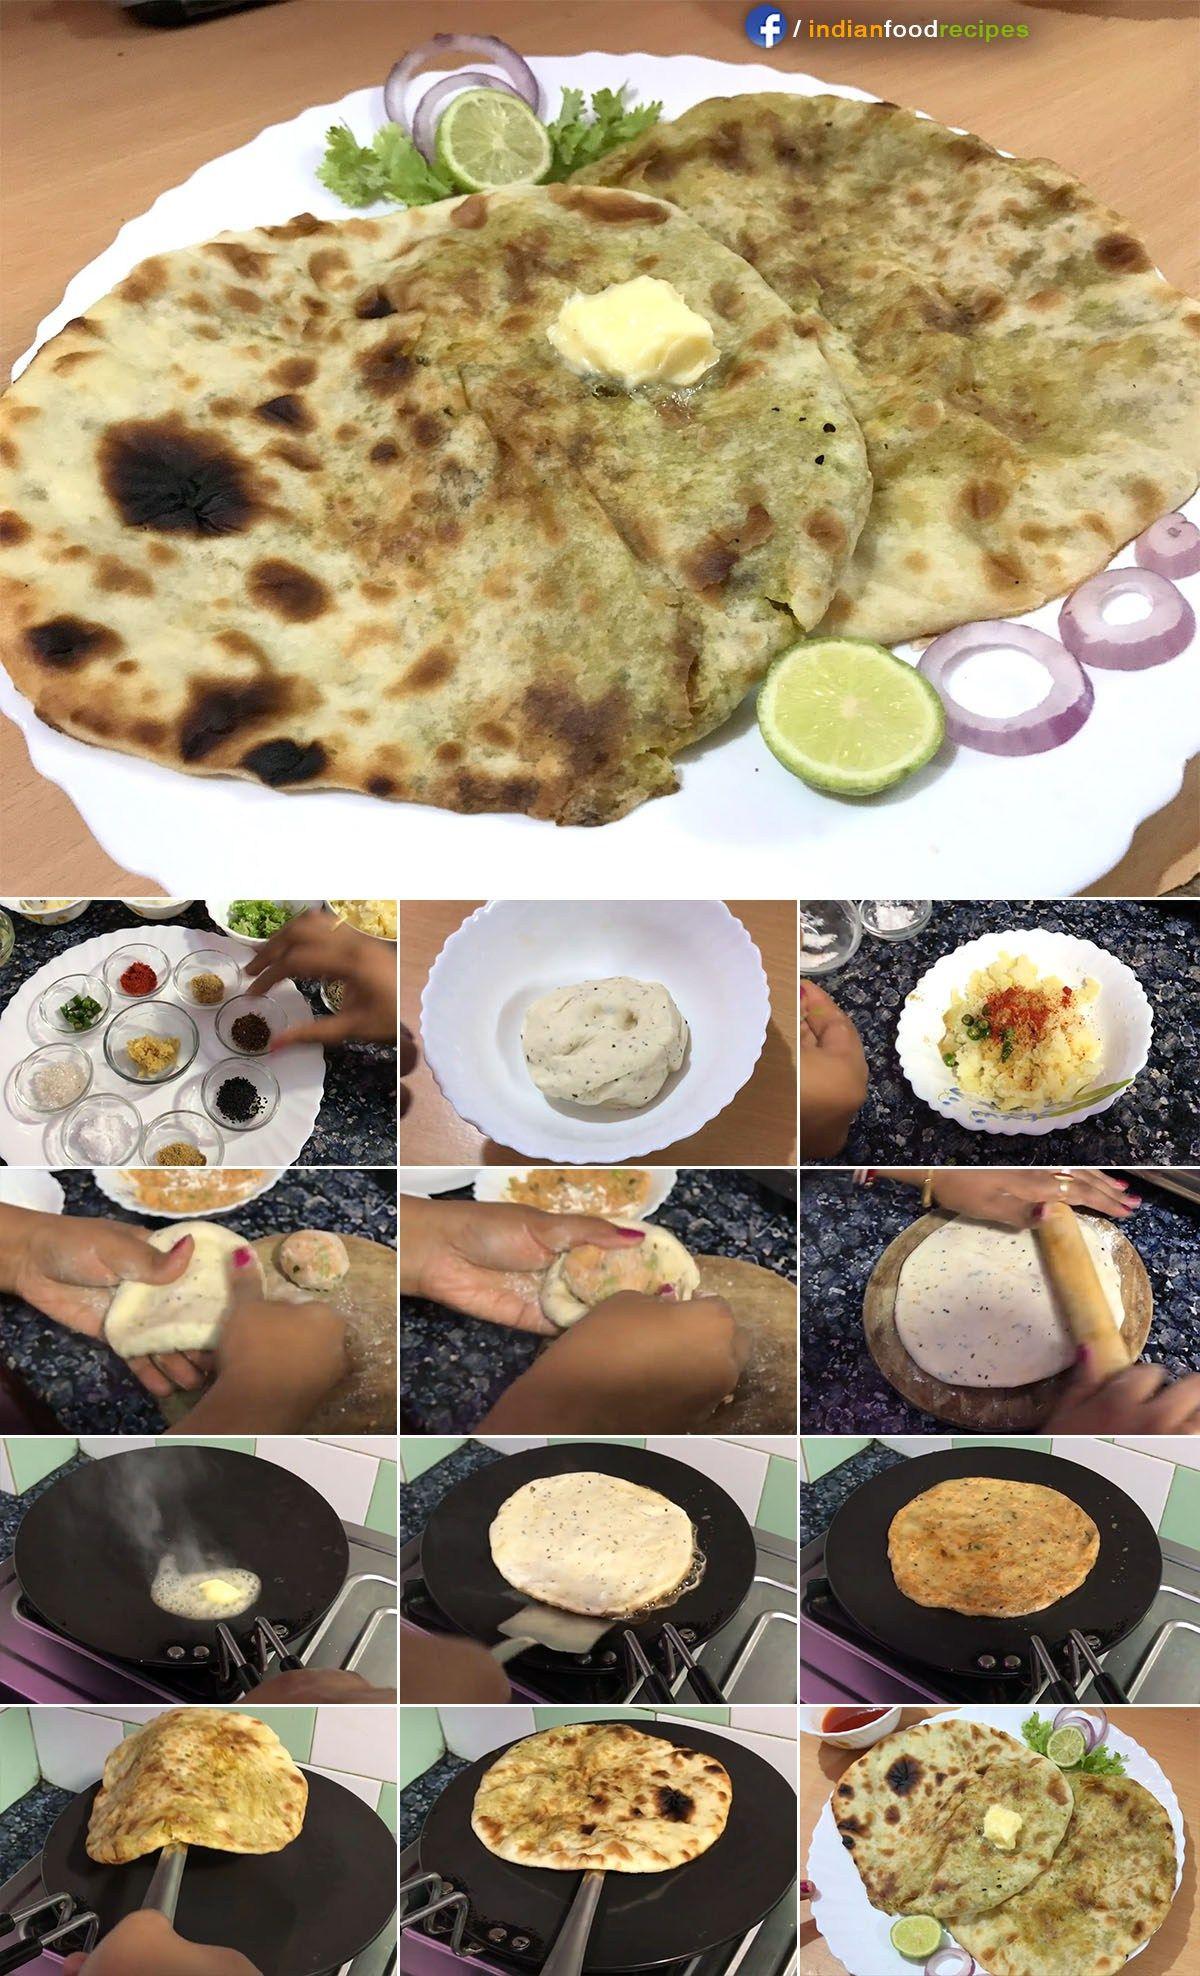 Amritsari aloo masala kulcha recipe step by step pictures food amritsari aloo masala kulcha recipe step by step pictures forumfinder Images